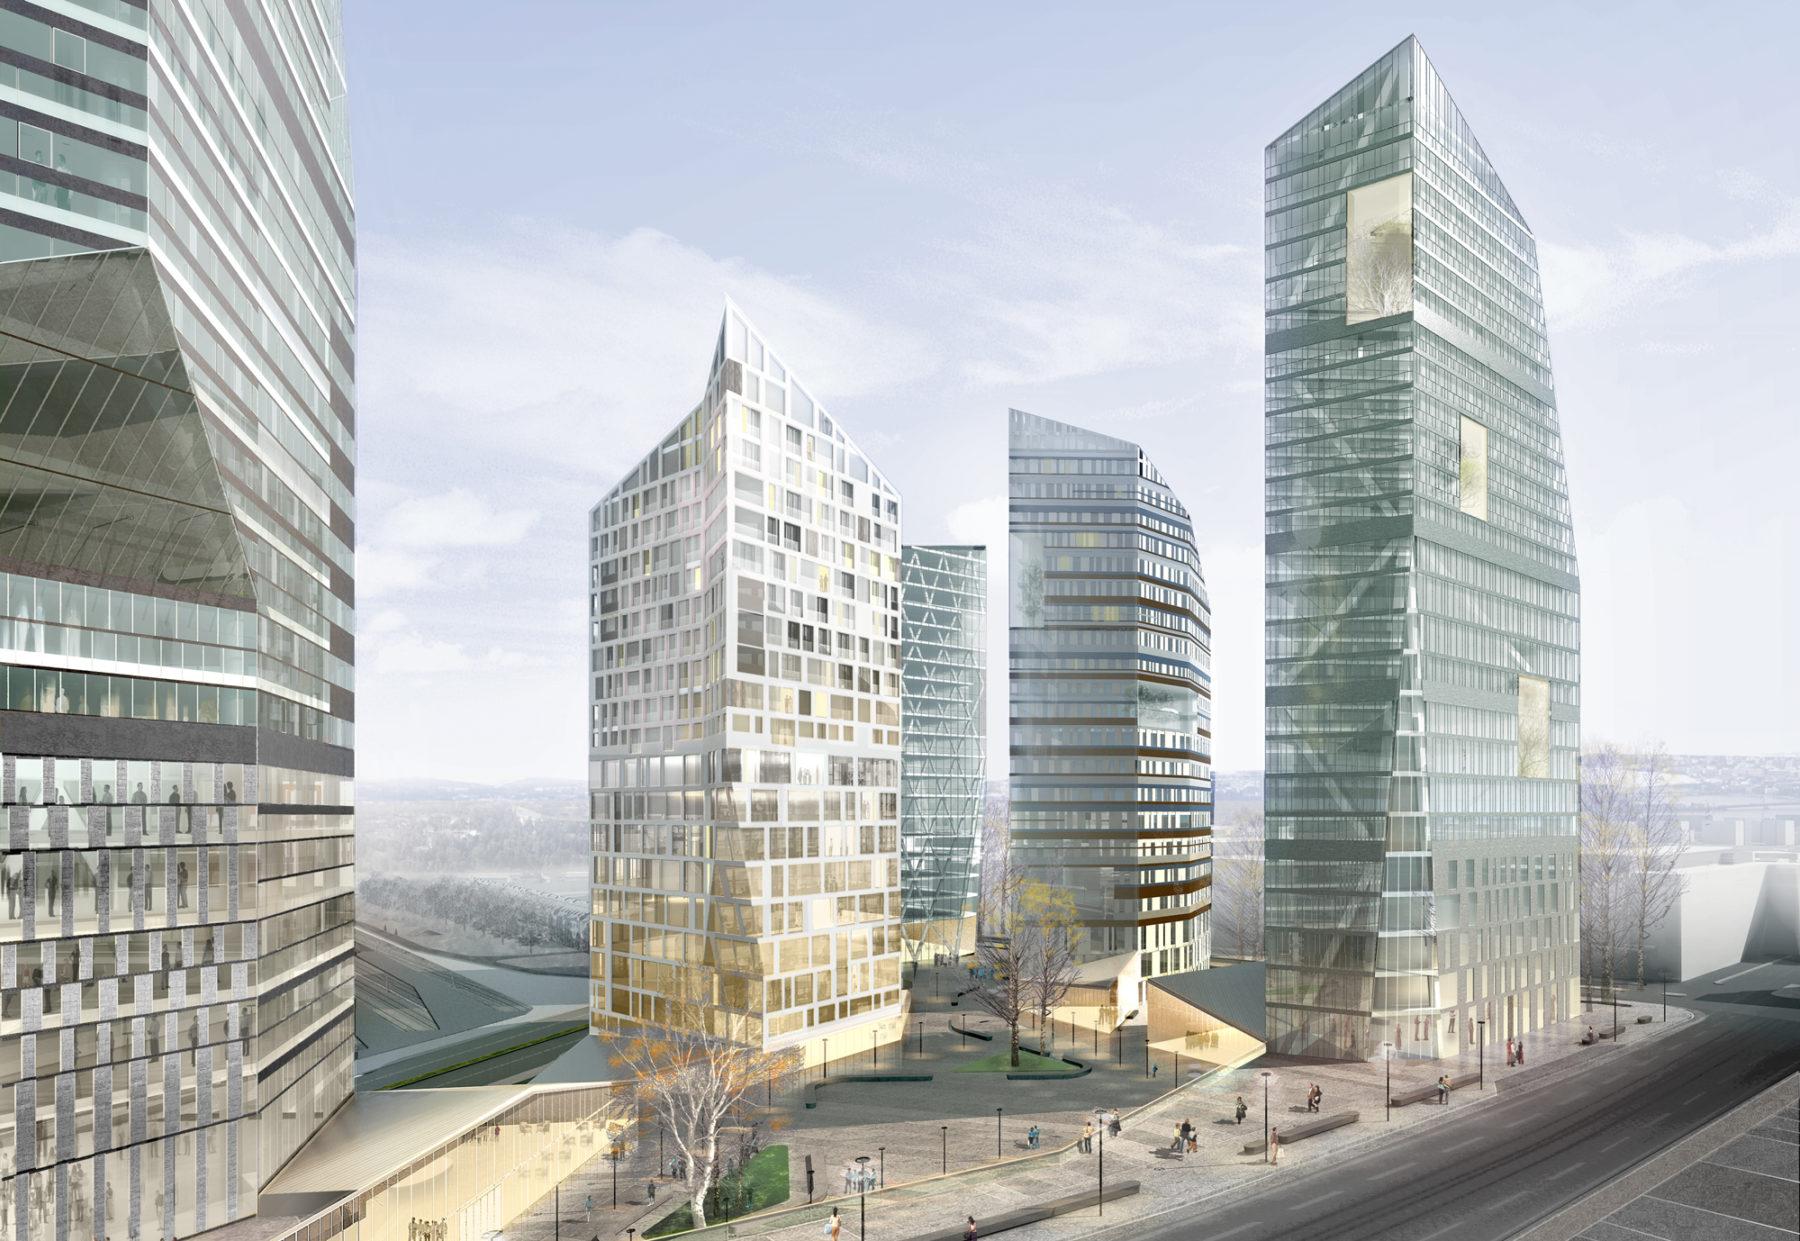 Helsinki Central Pasila Masterplan